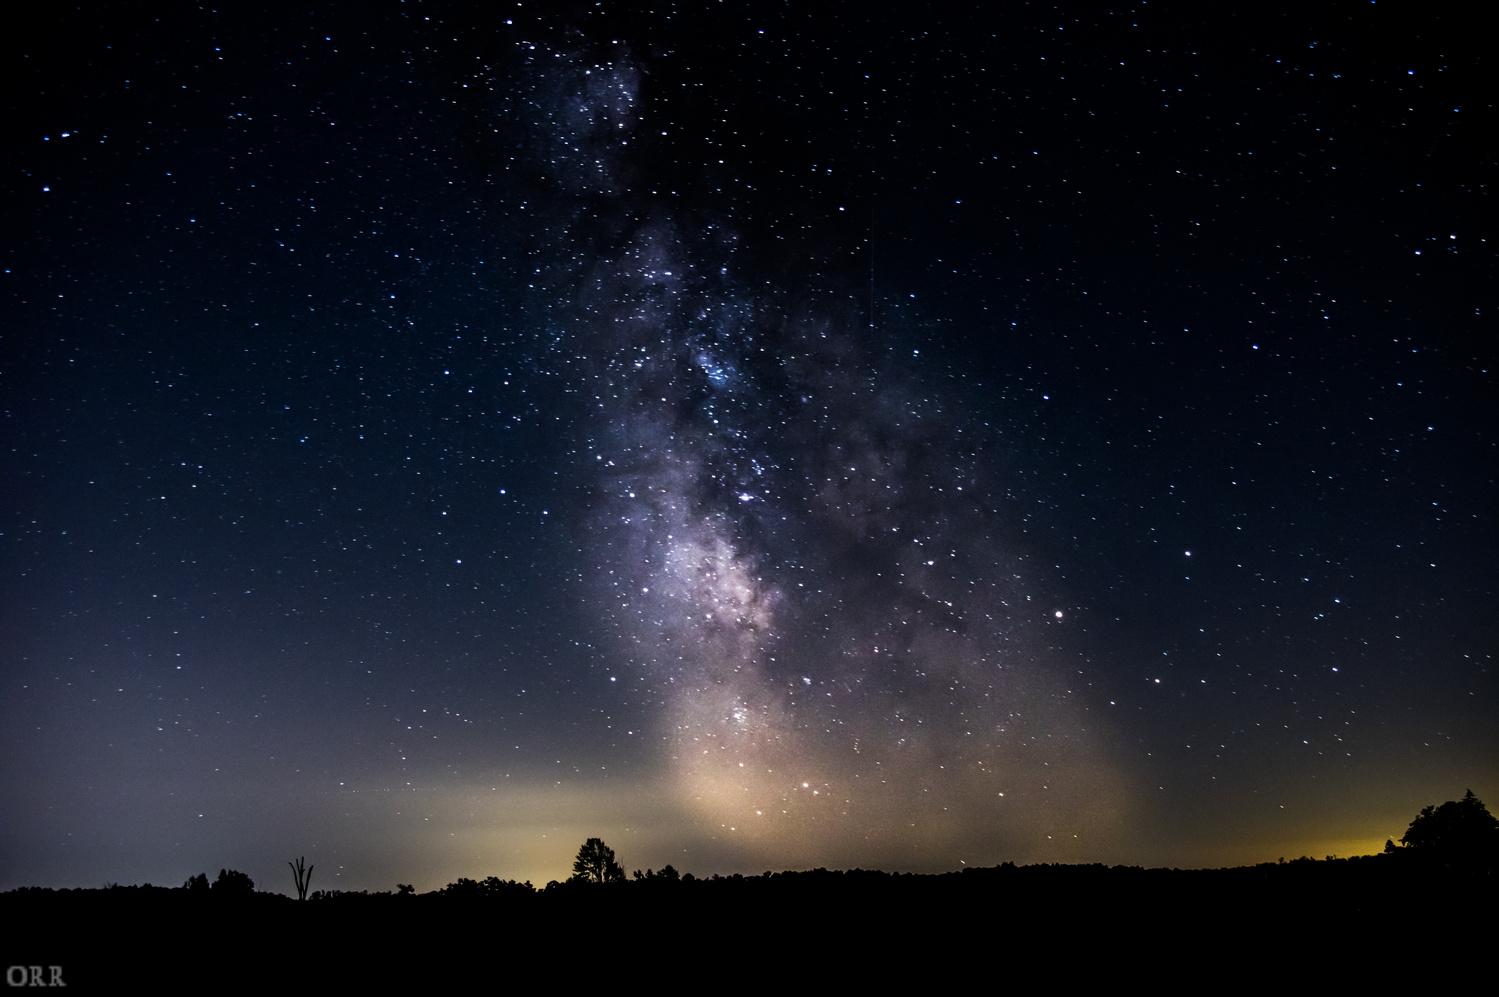 Milky way by Jason Orr